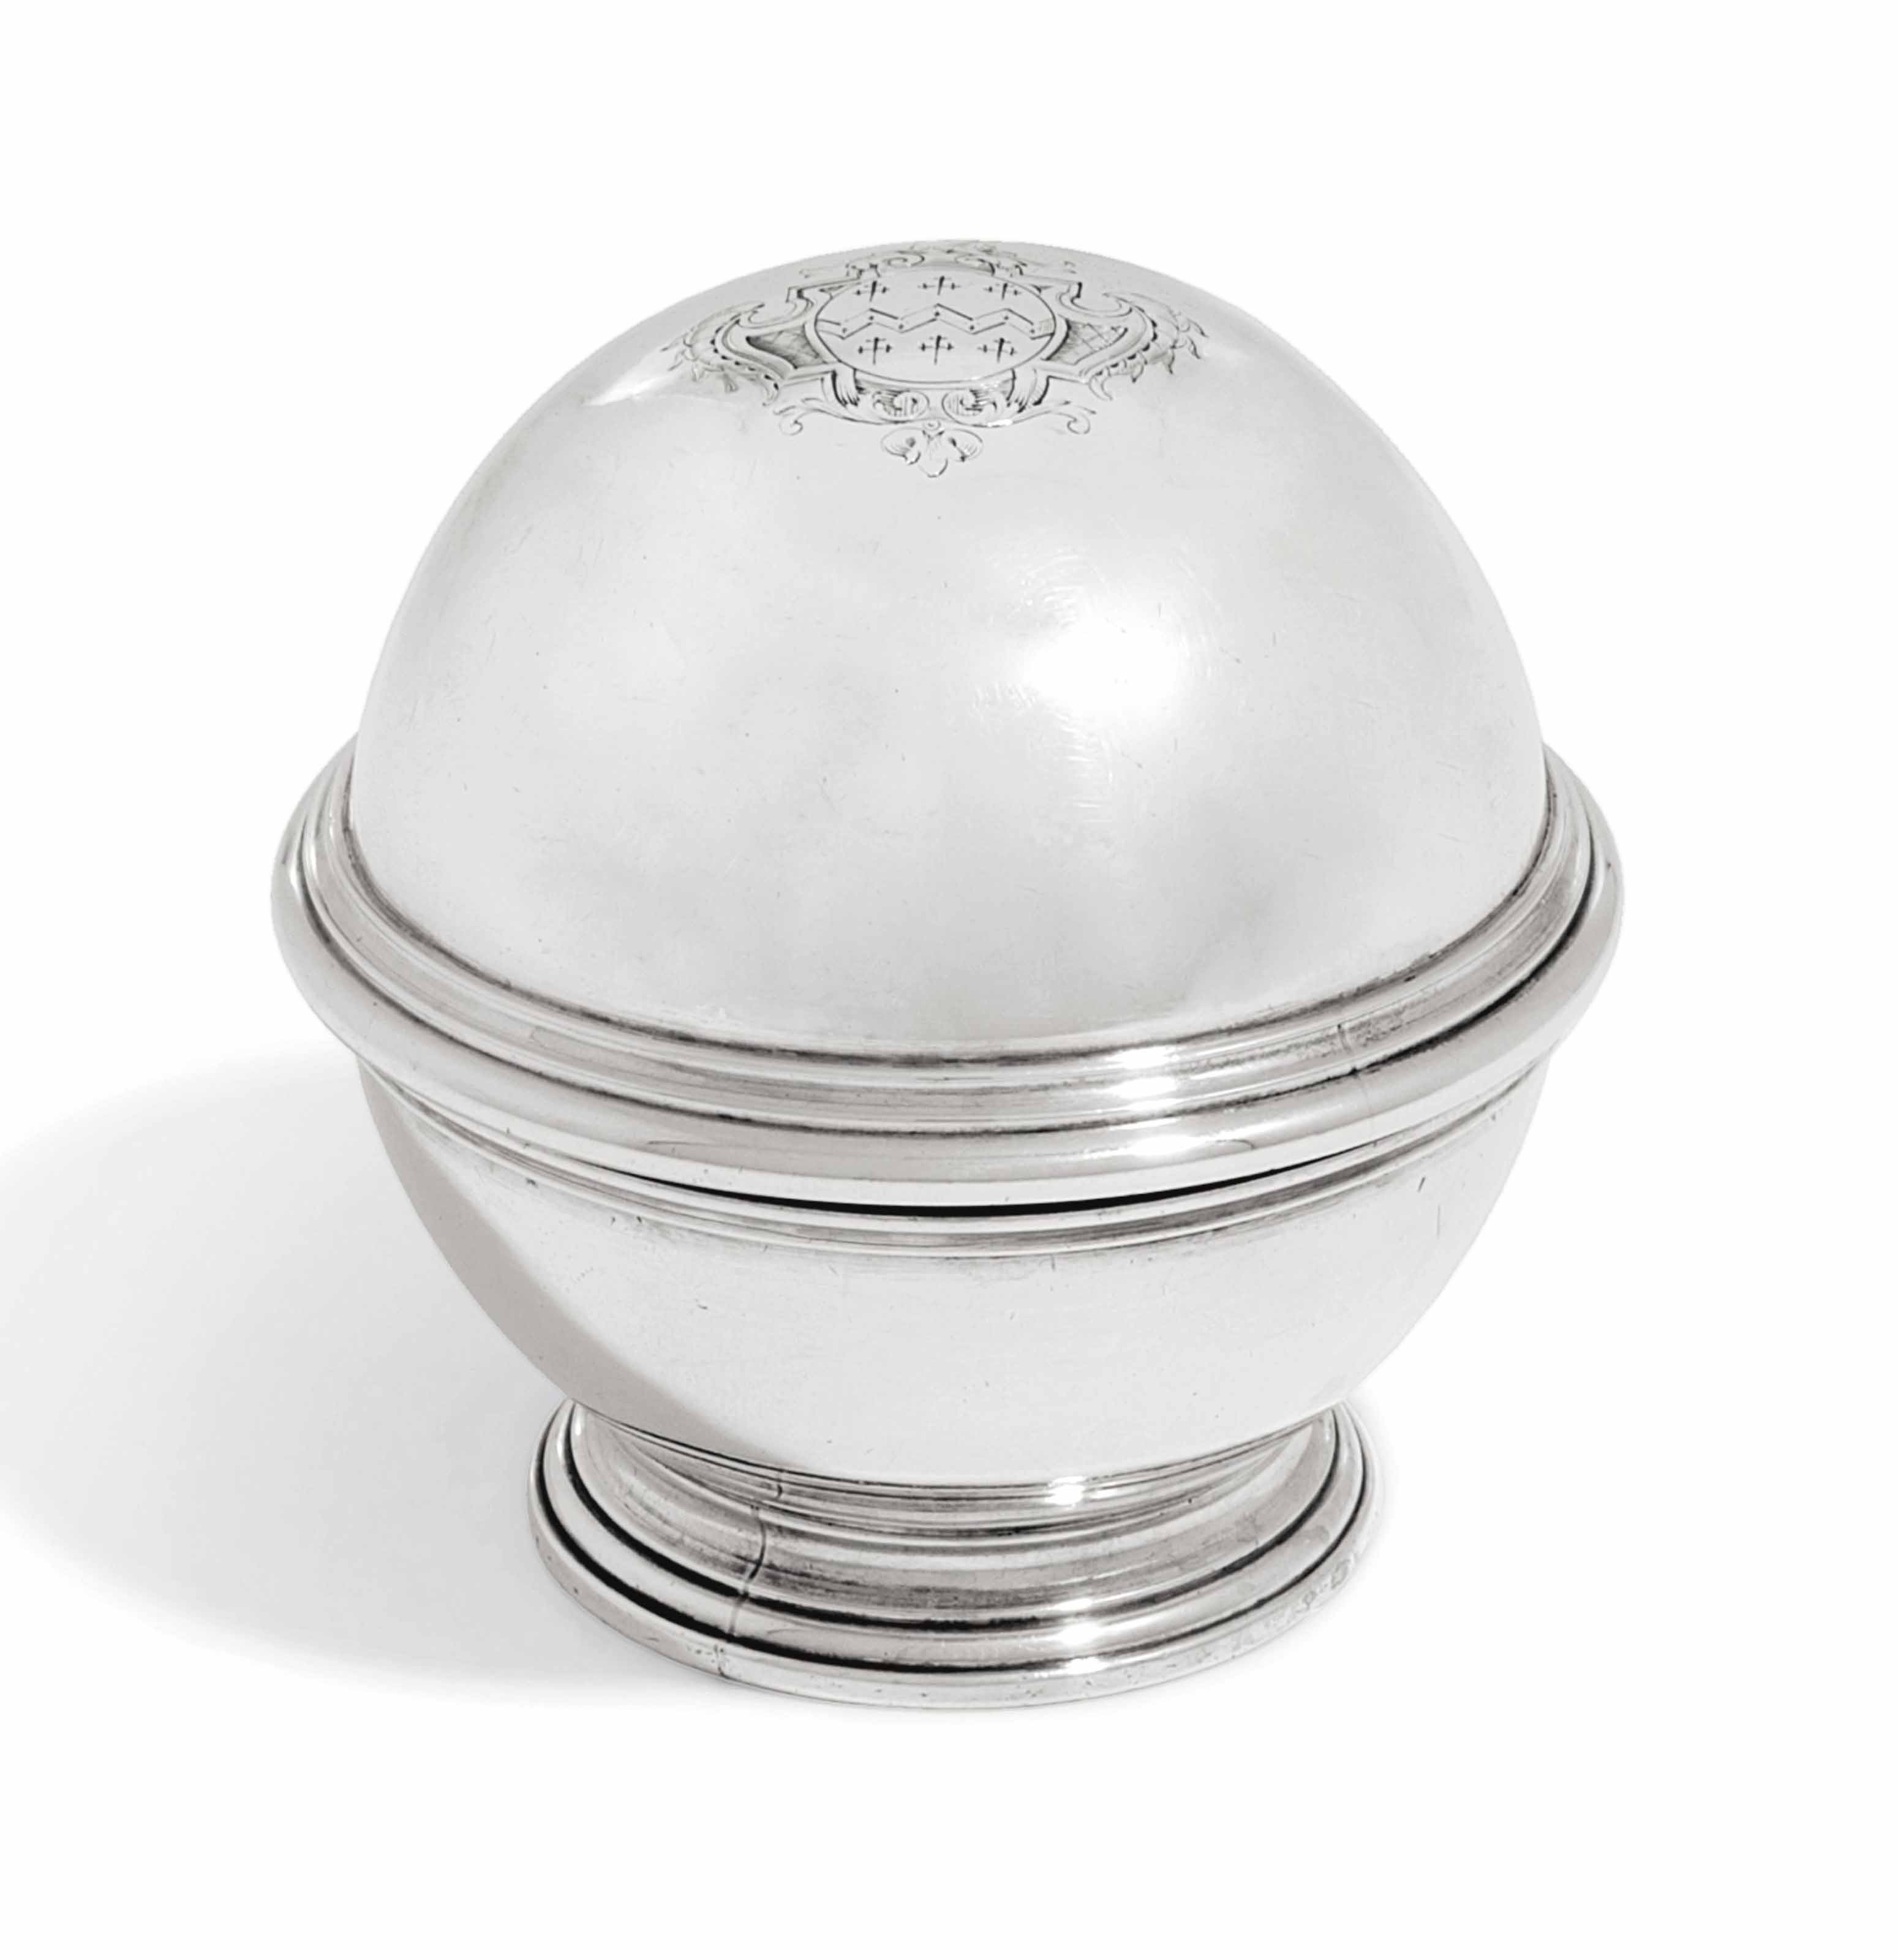 A GEORGE II SILVER SOAP-BOX